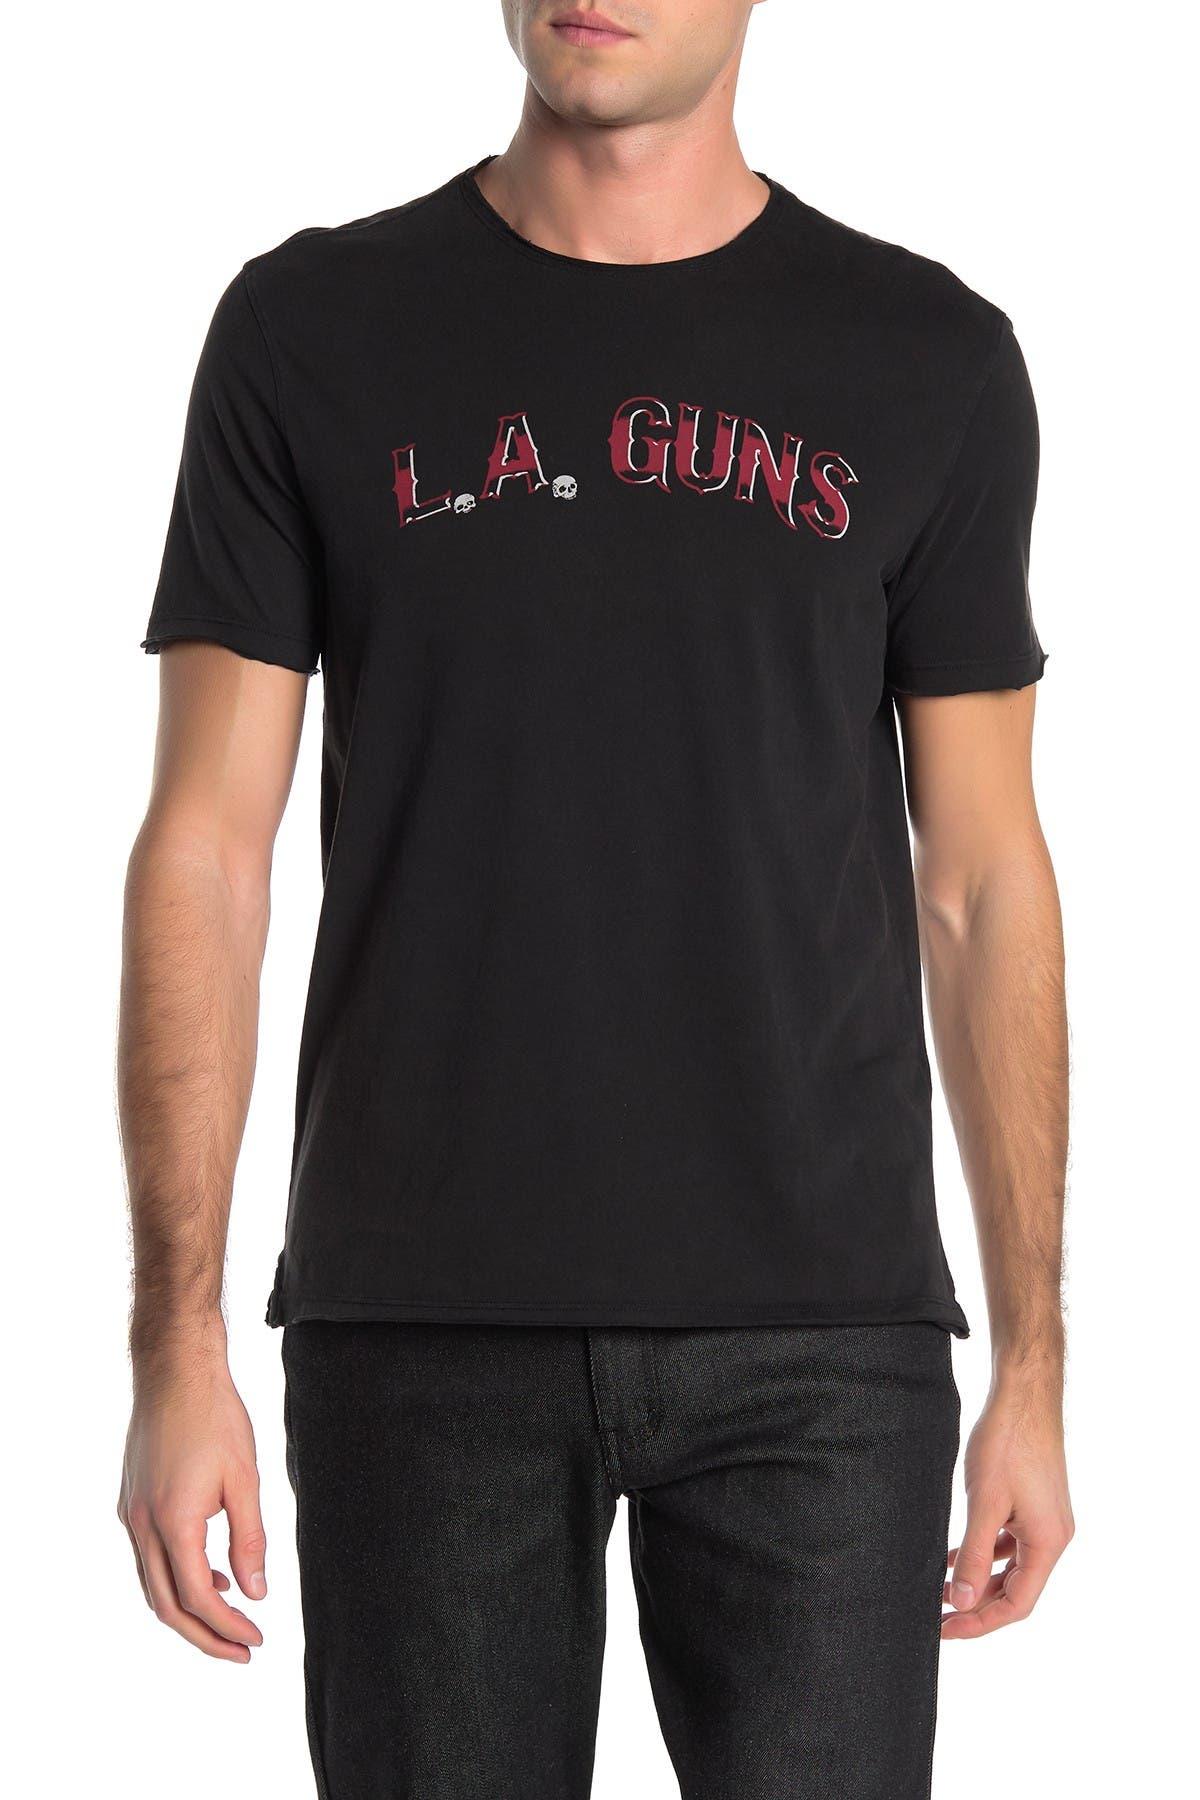 NWT JOHN VARVATOS MENS L.A GUNS LA GUNS TEE T-SHIRT BLACK